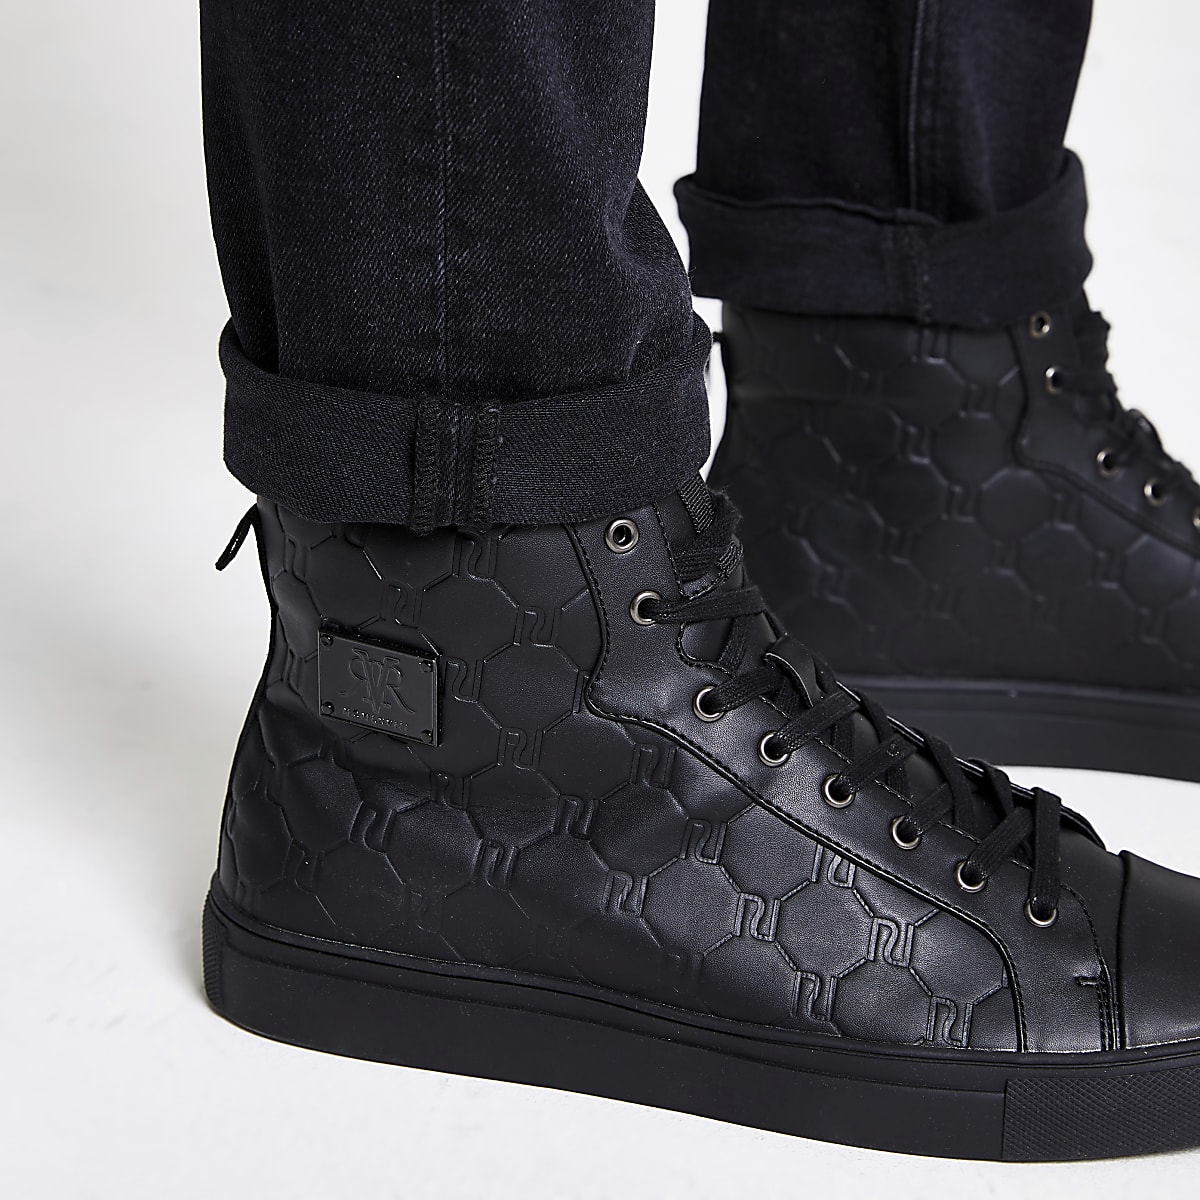 b60a8d2b5 Black RI monogram high top trainers - Trainers - Shoes   Boots - men